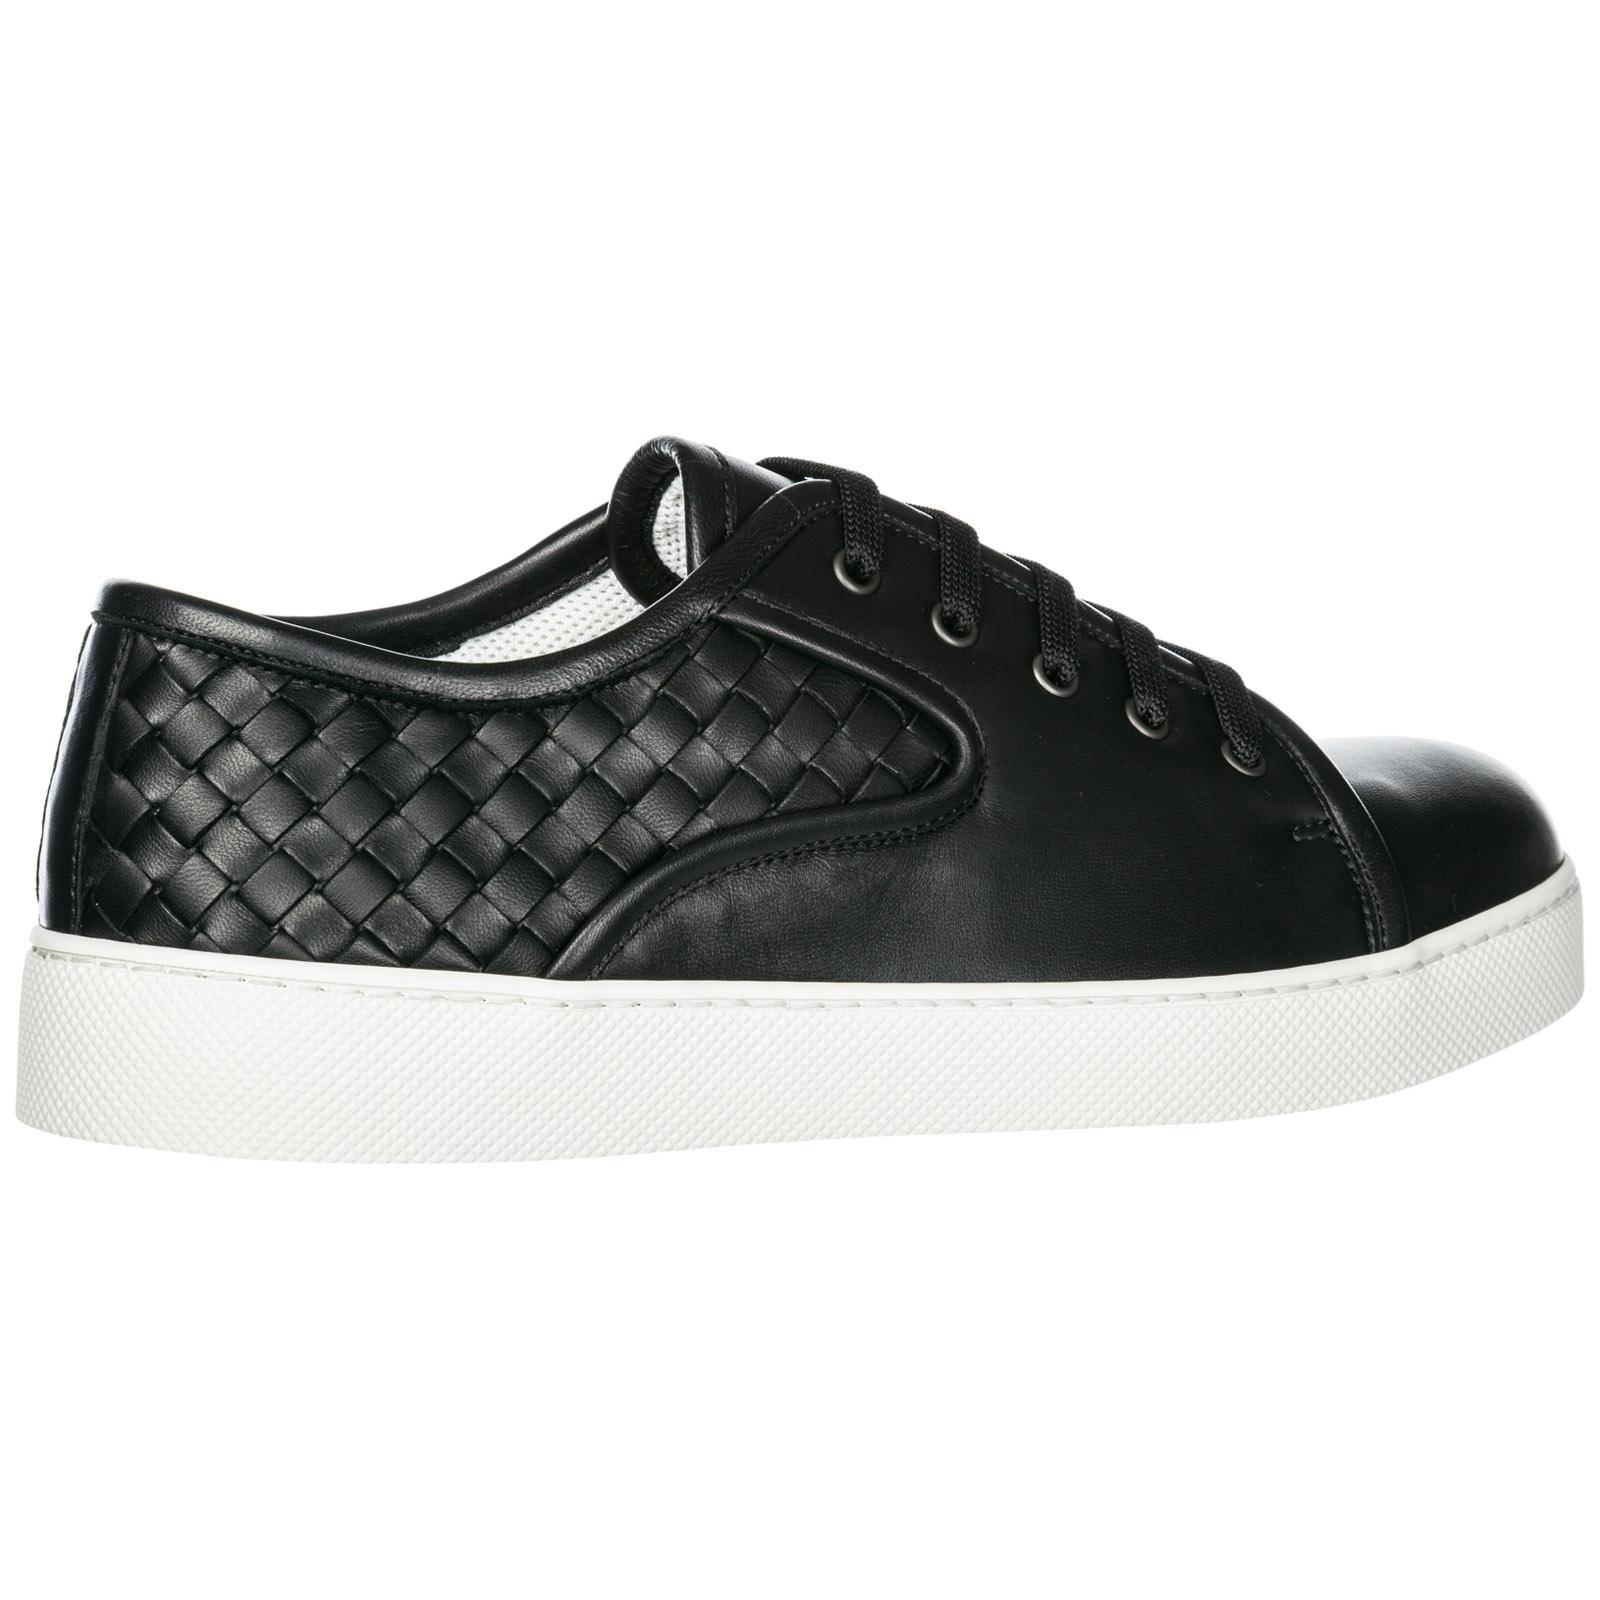 bottega veneta mens shoes online